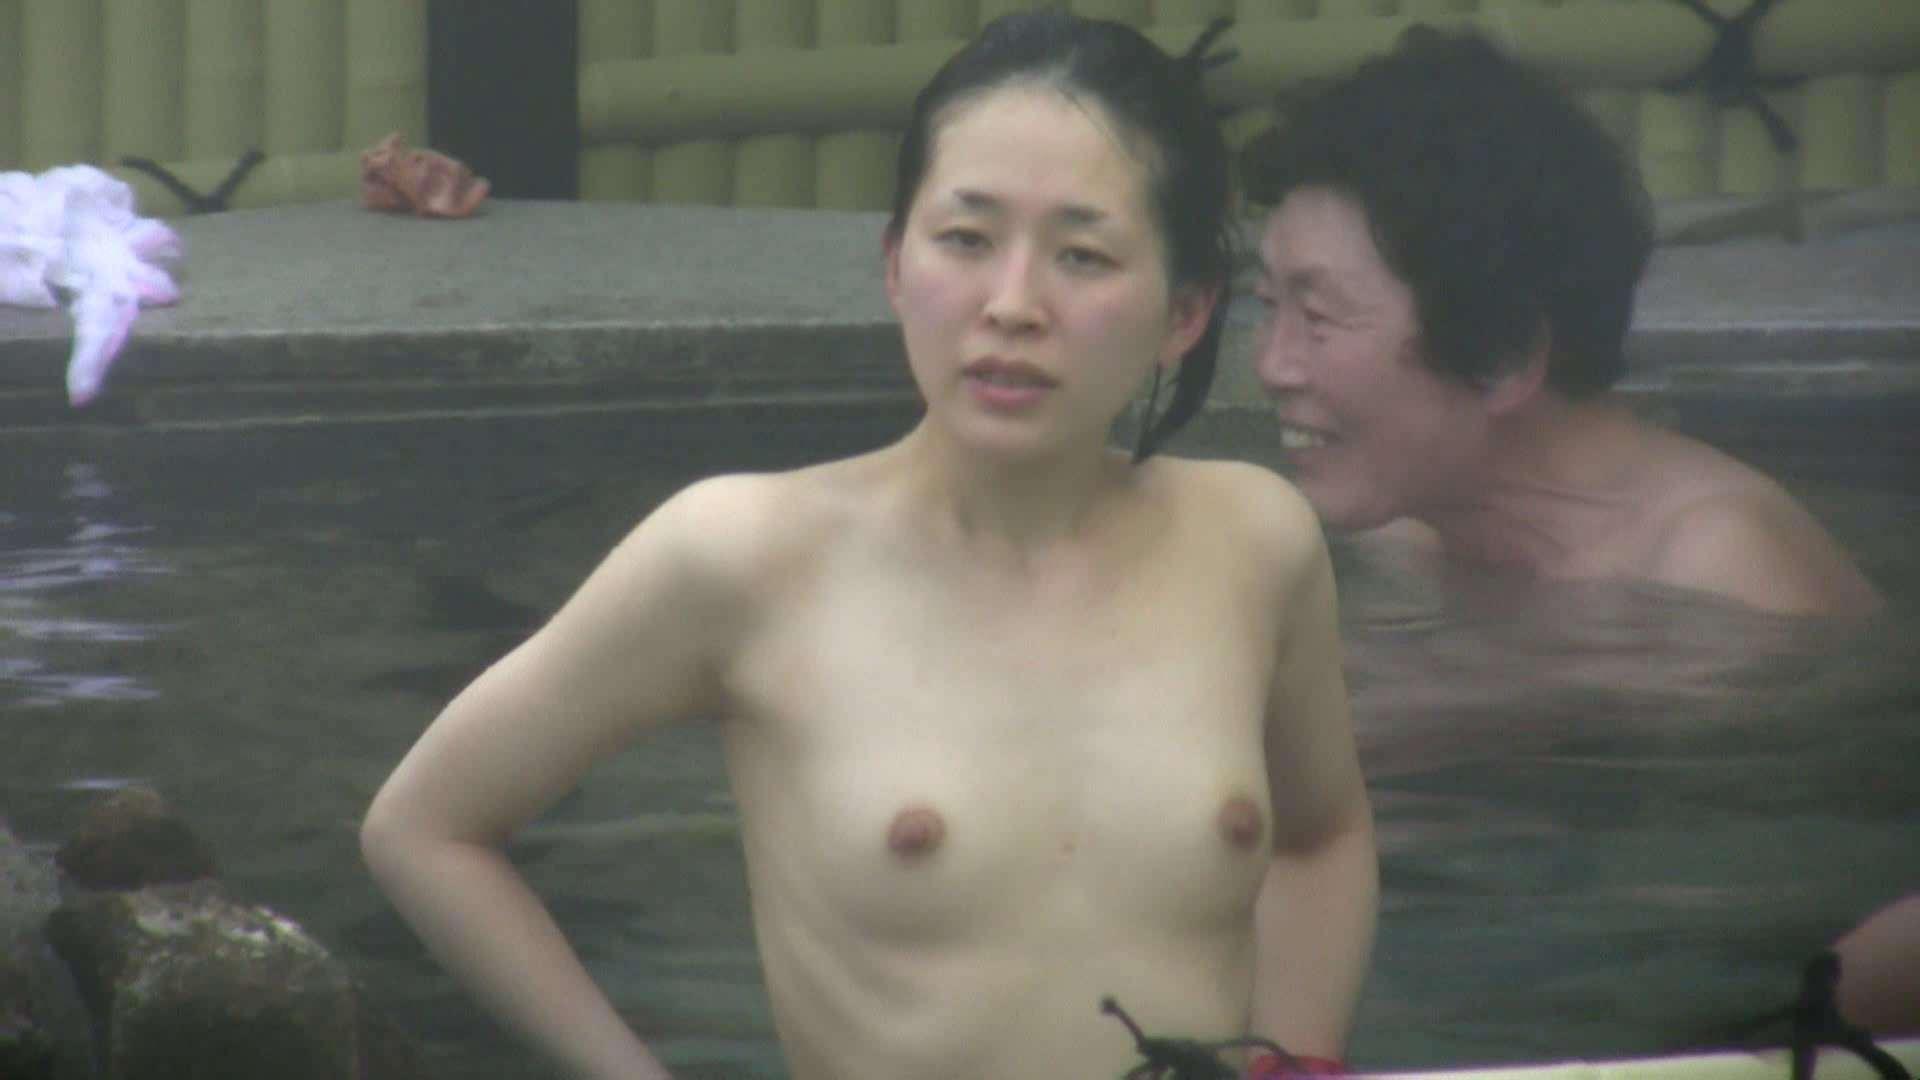 Aquaな露天風呂Vol.583 美しいOLの裸体 すけべAV動画紹介 103pic 41